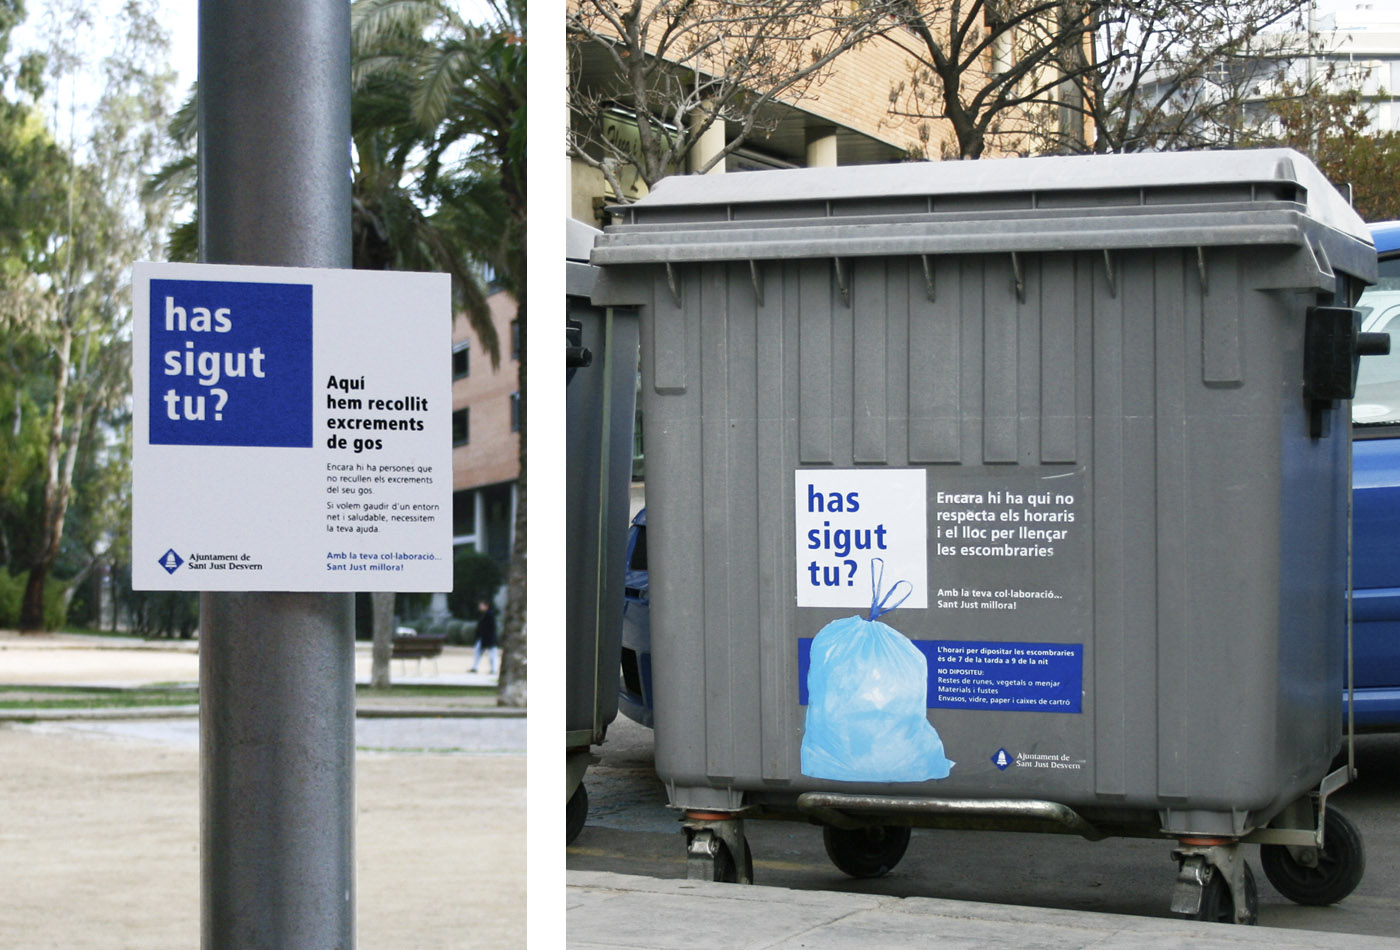 sant-just-desvern-barcelona-publicitat-campanya-creartiva-anunci